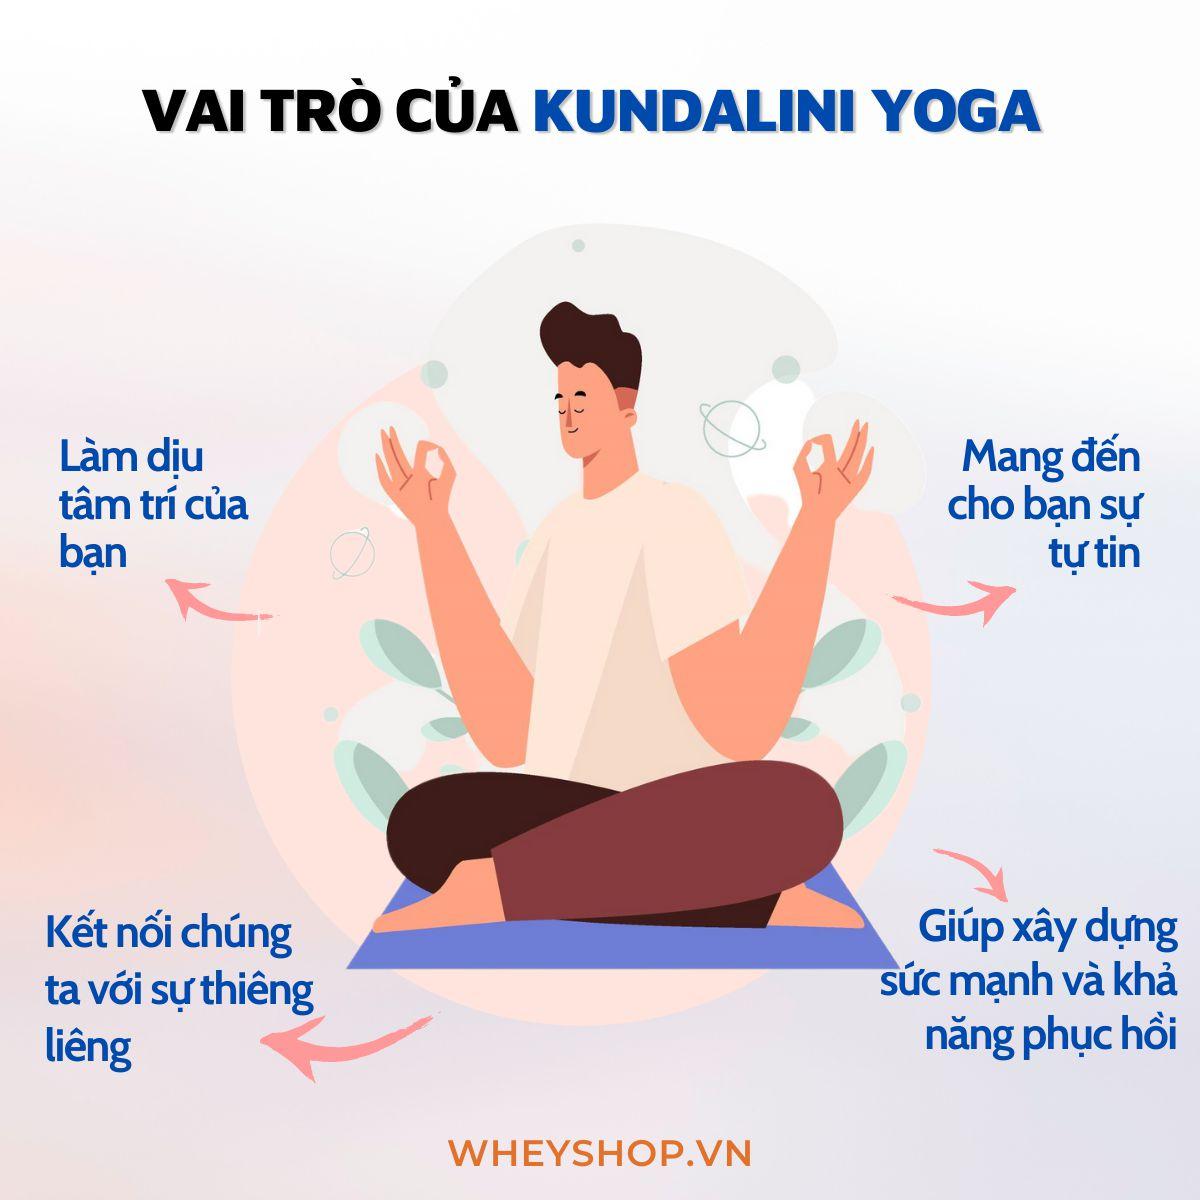 huong dan tap kundalini yoga cho nguoi moi 1 1